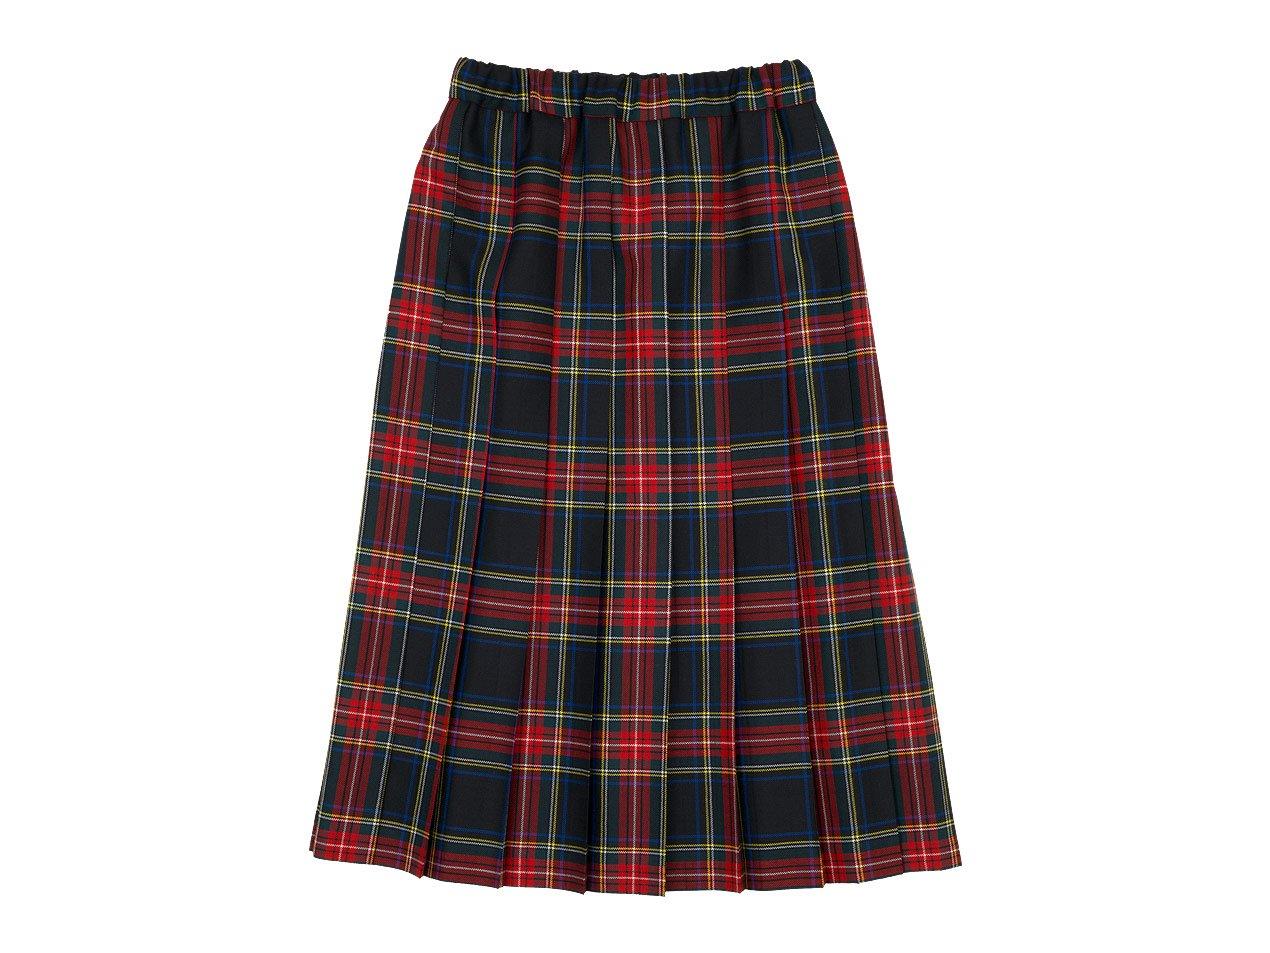 Charpentier de Vaisseau Bride O'neil of Dublin プリーツスカート Long RED x BLACK CHECK